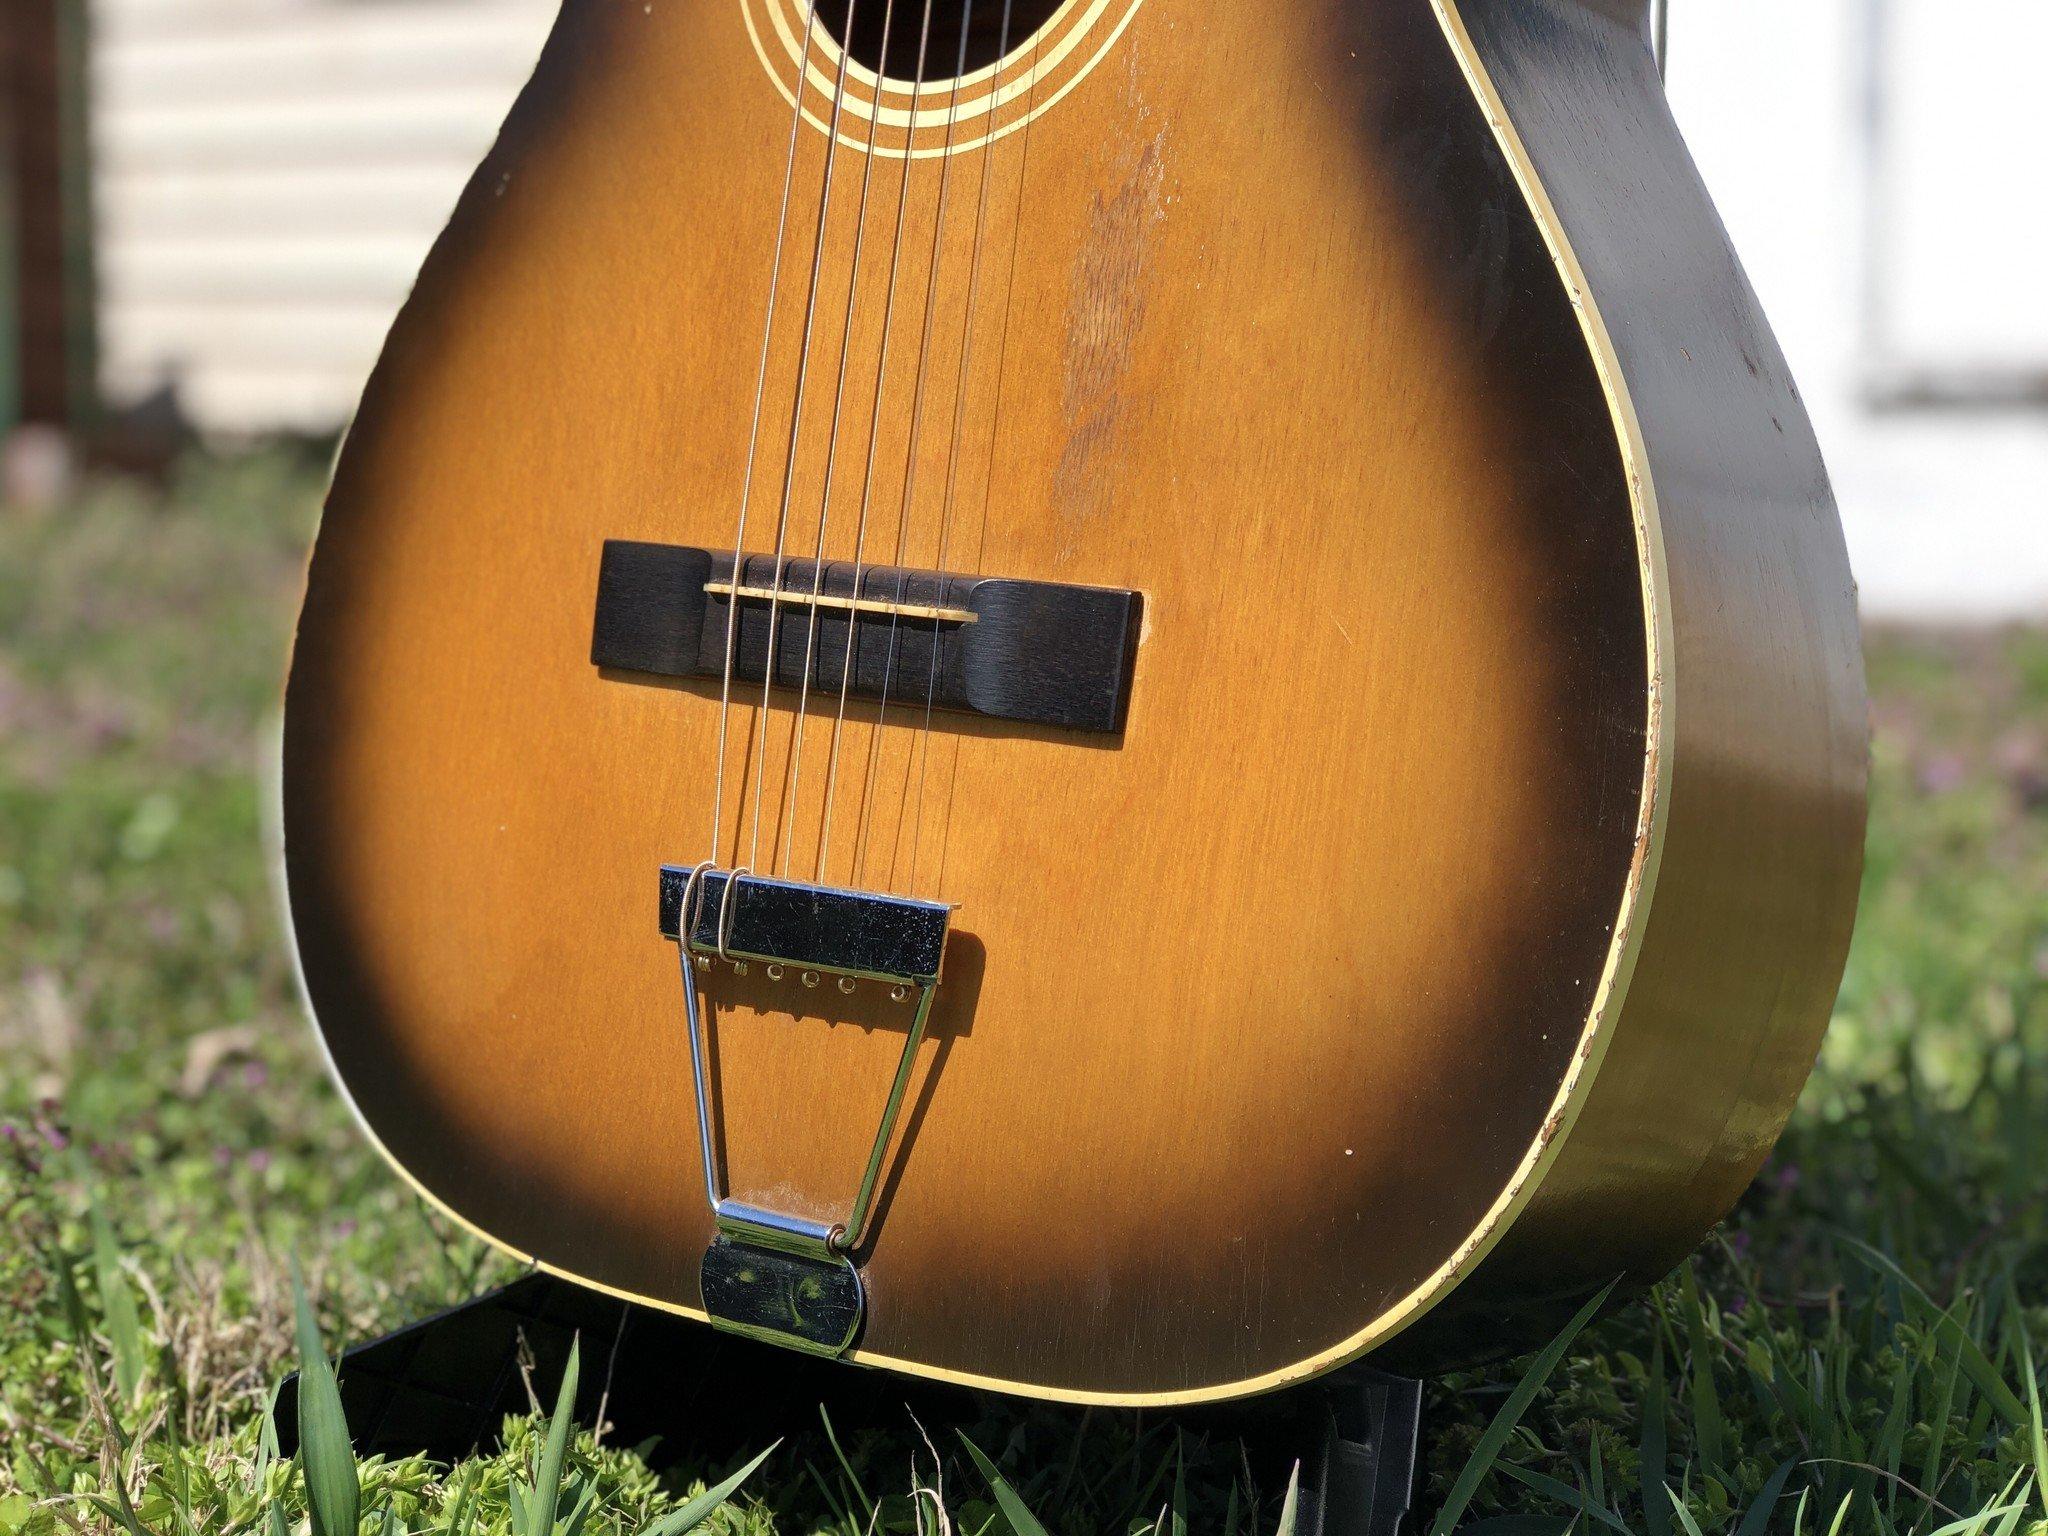 1960s Stella 12-string (strung up for 6 string) 7164 H922-4